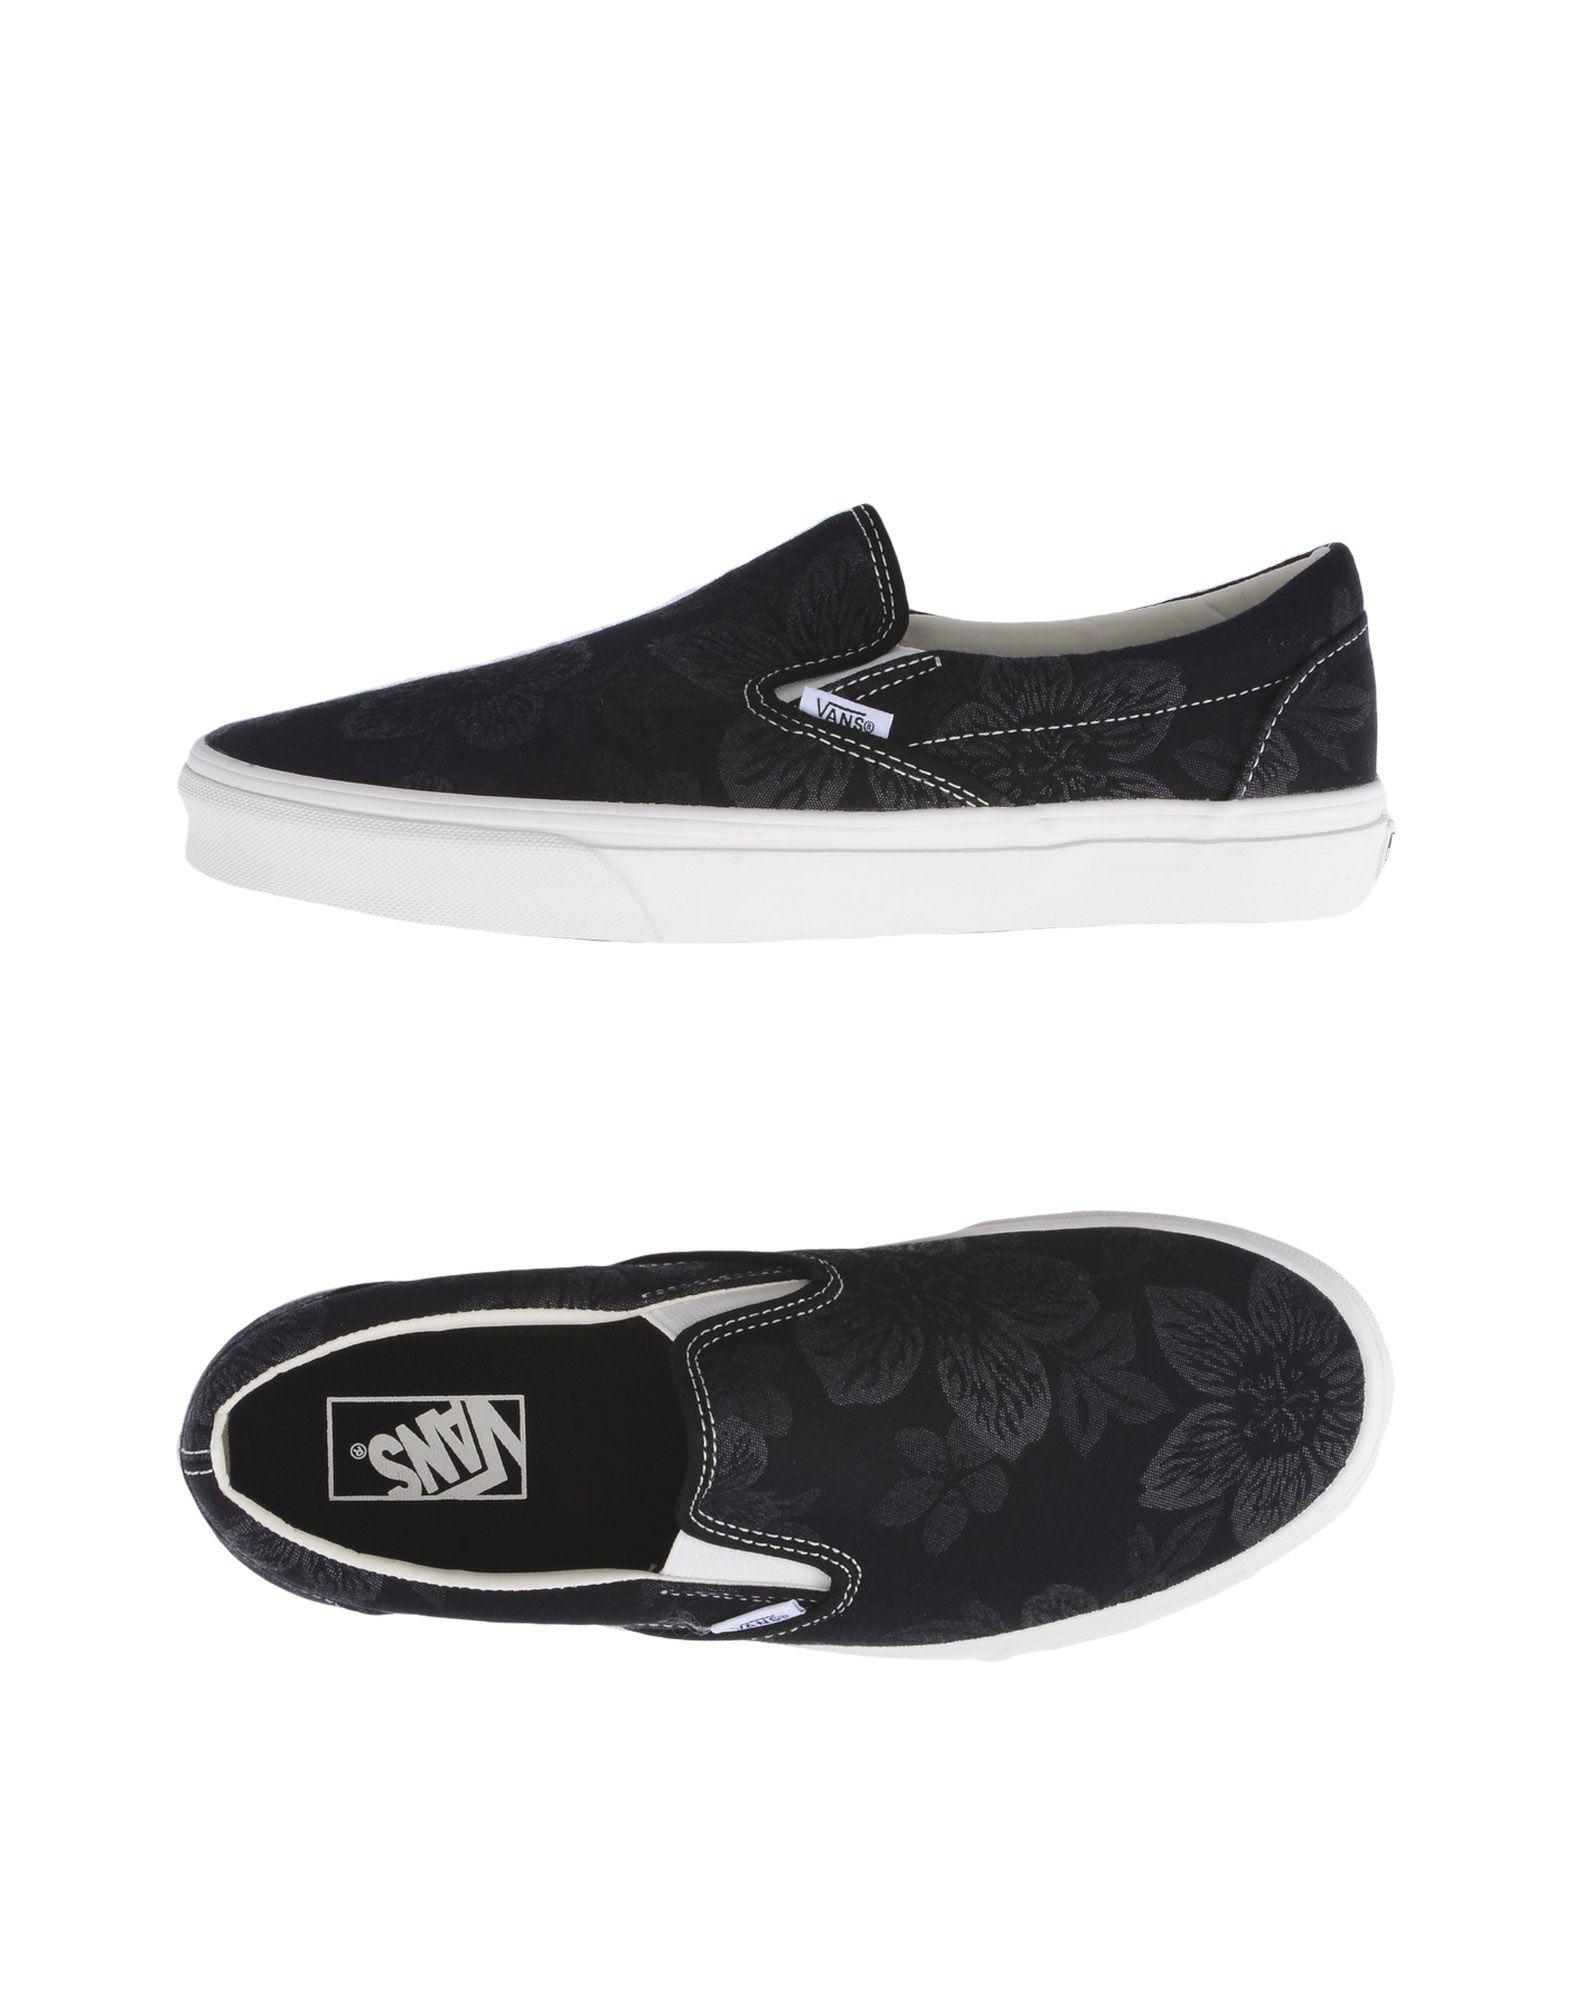 Vans Ua Classic Slip-On - Floral Jacquard - Sneakers - Men Vans ... be906a722